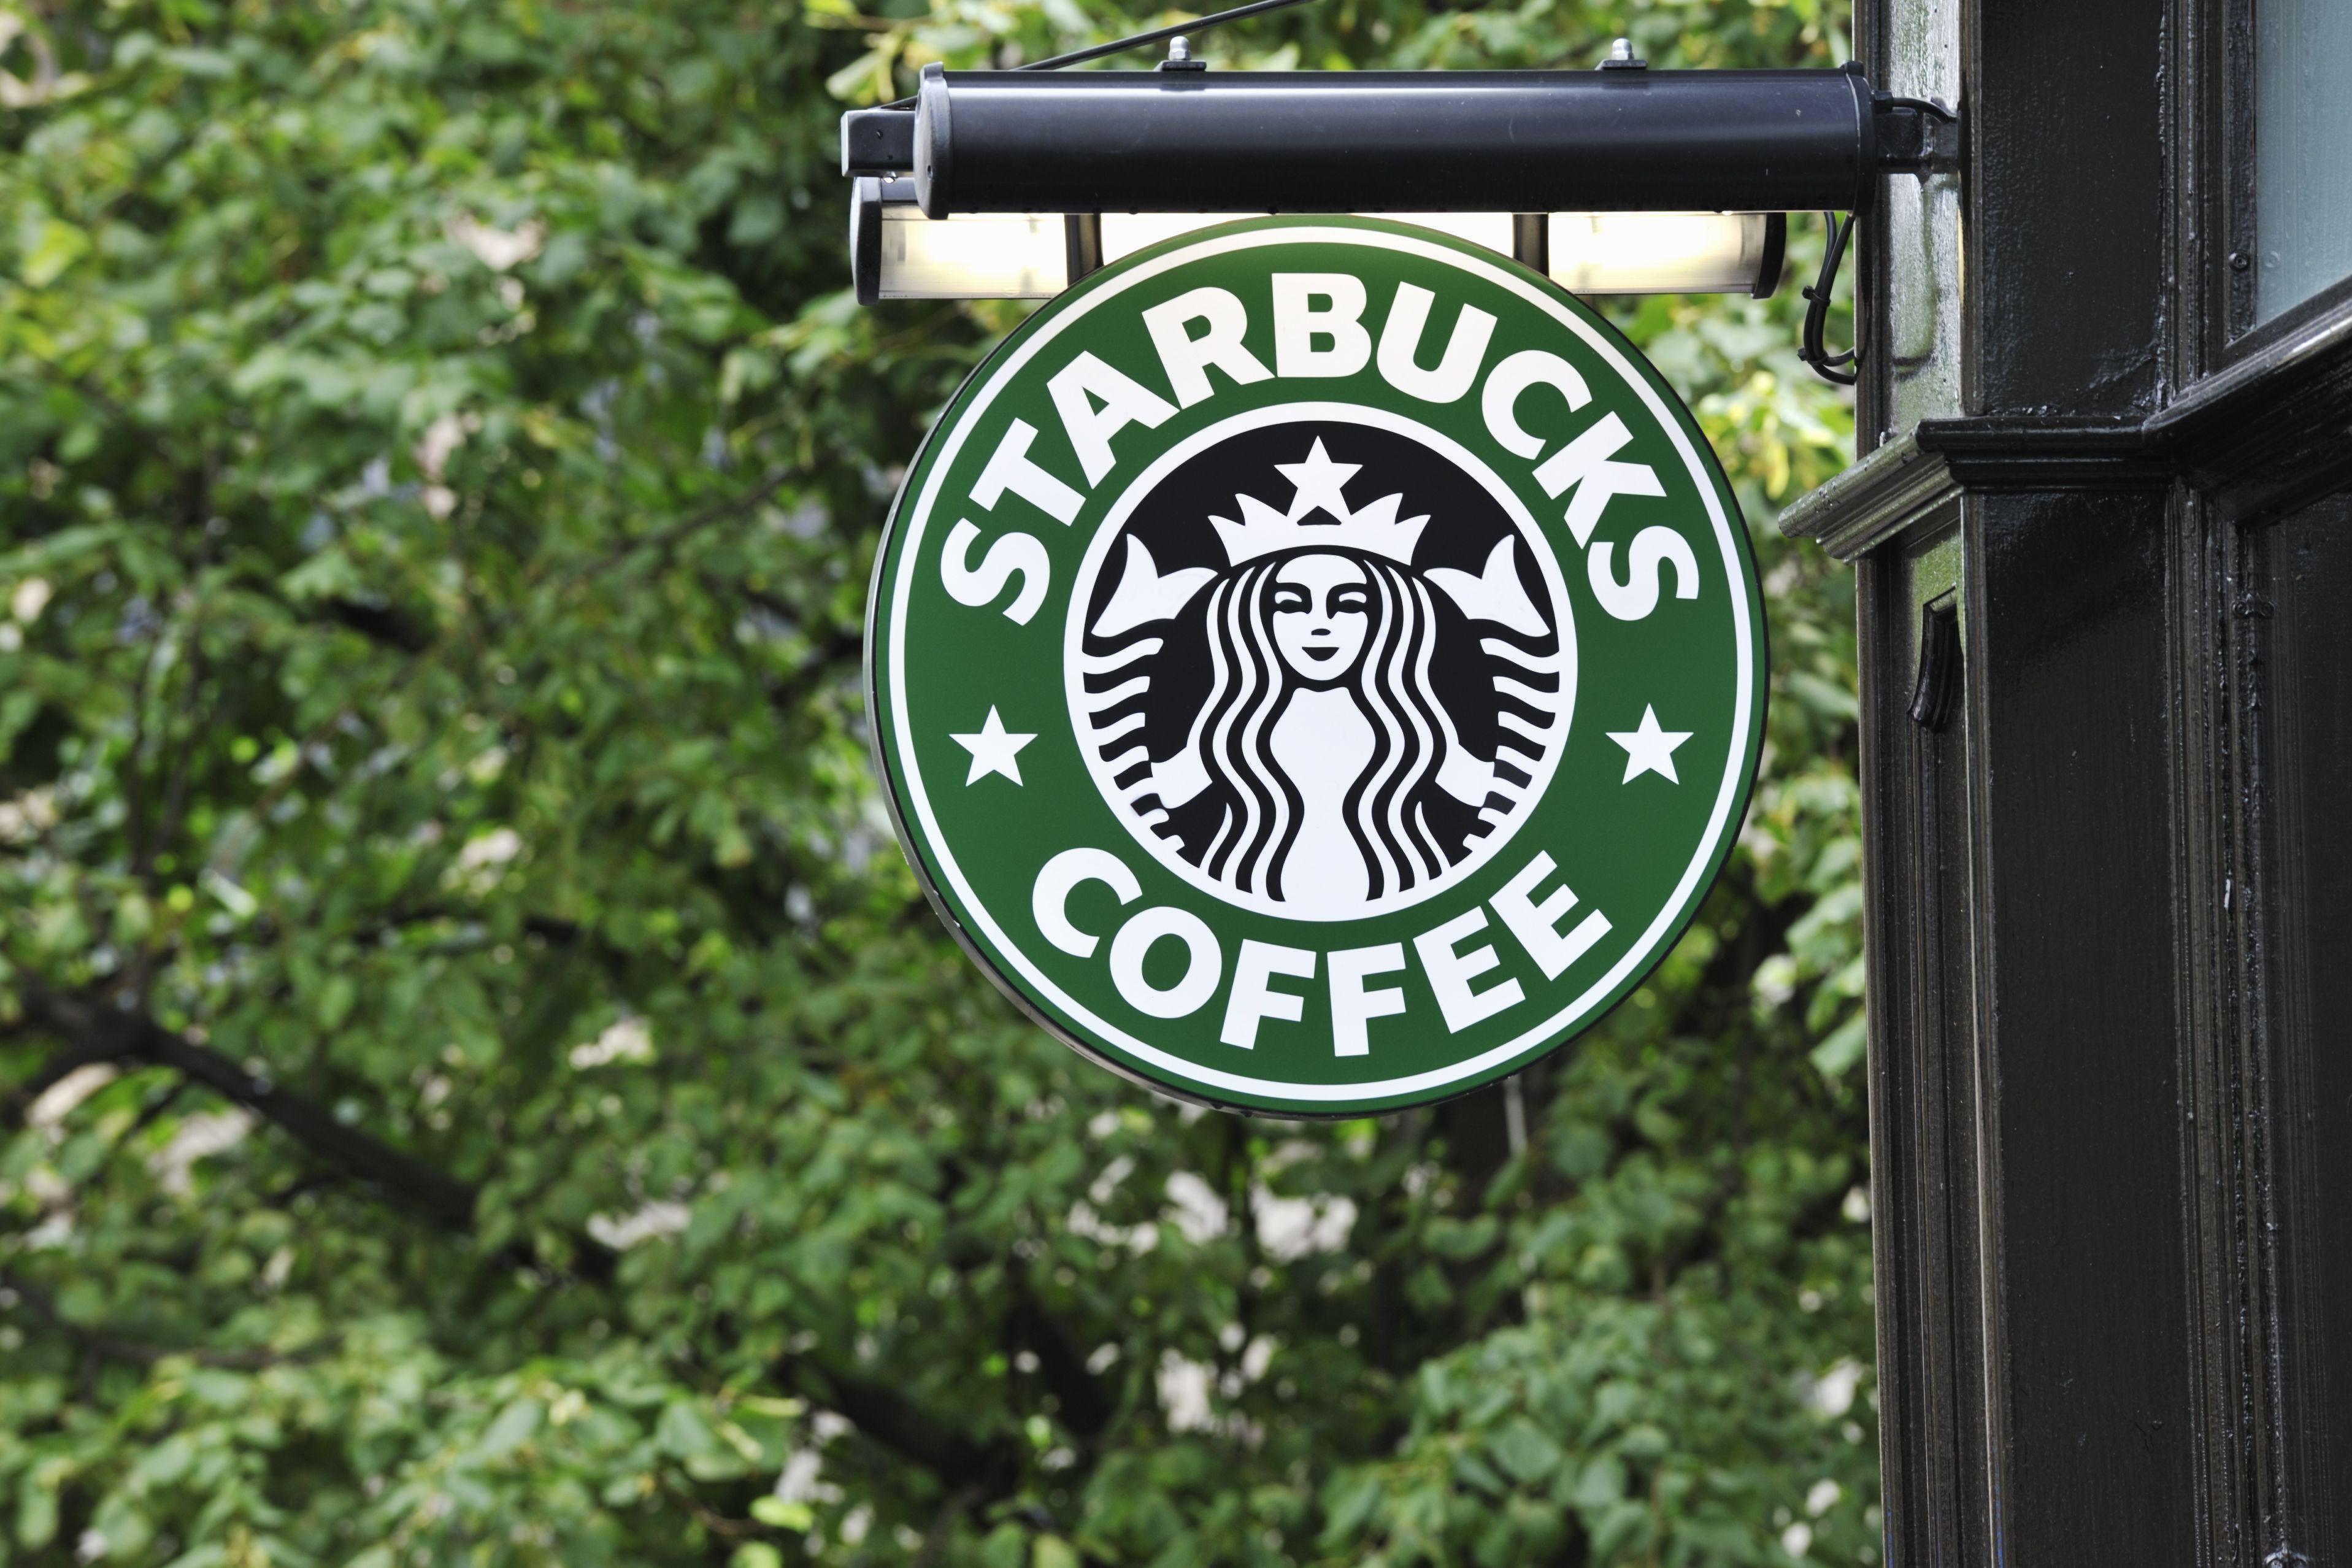 Is Starbucks Open on Memorial Day?